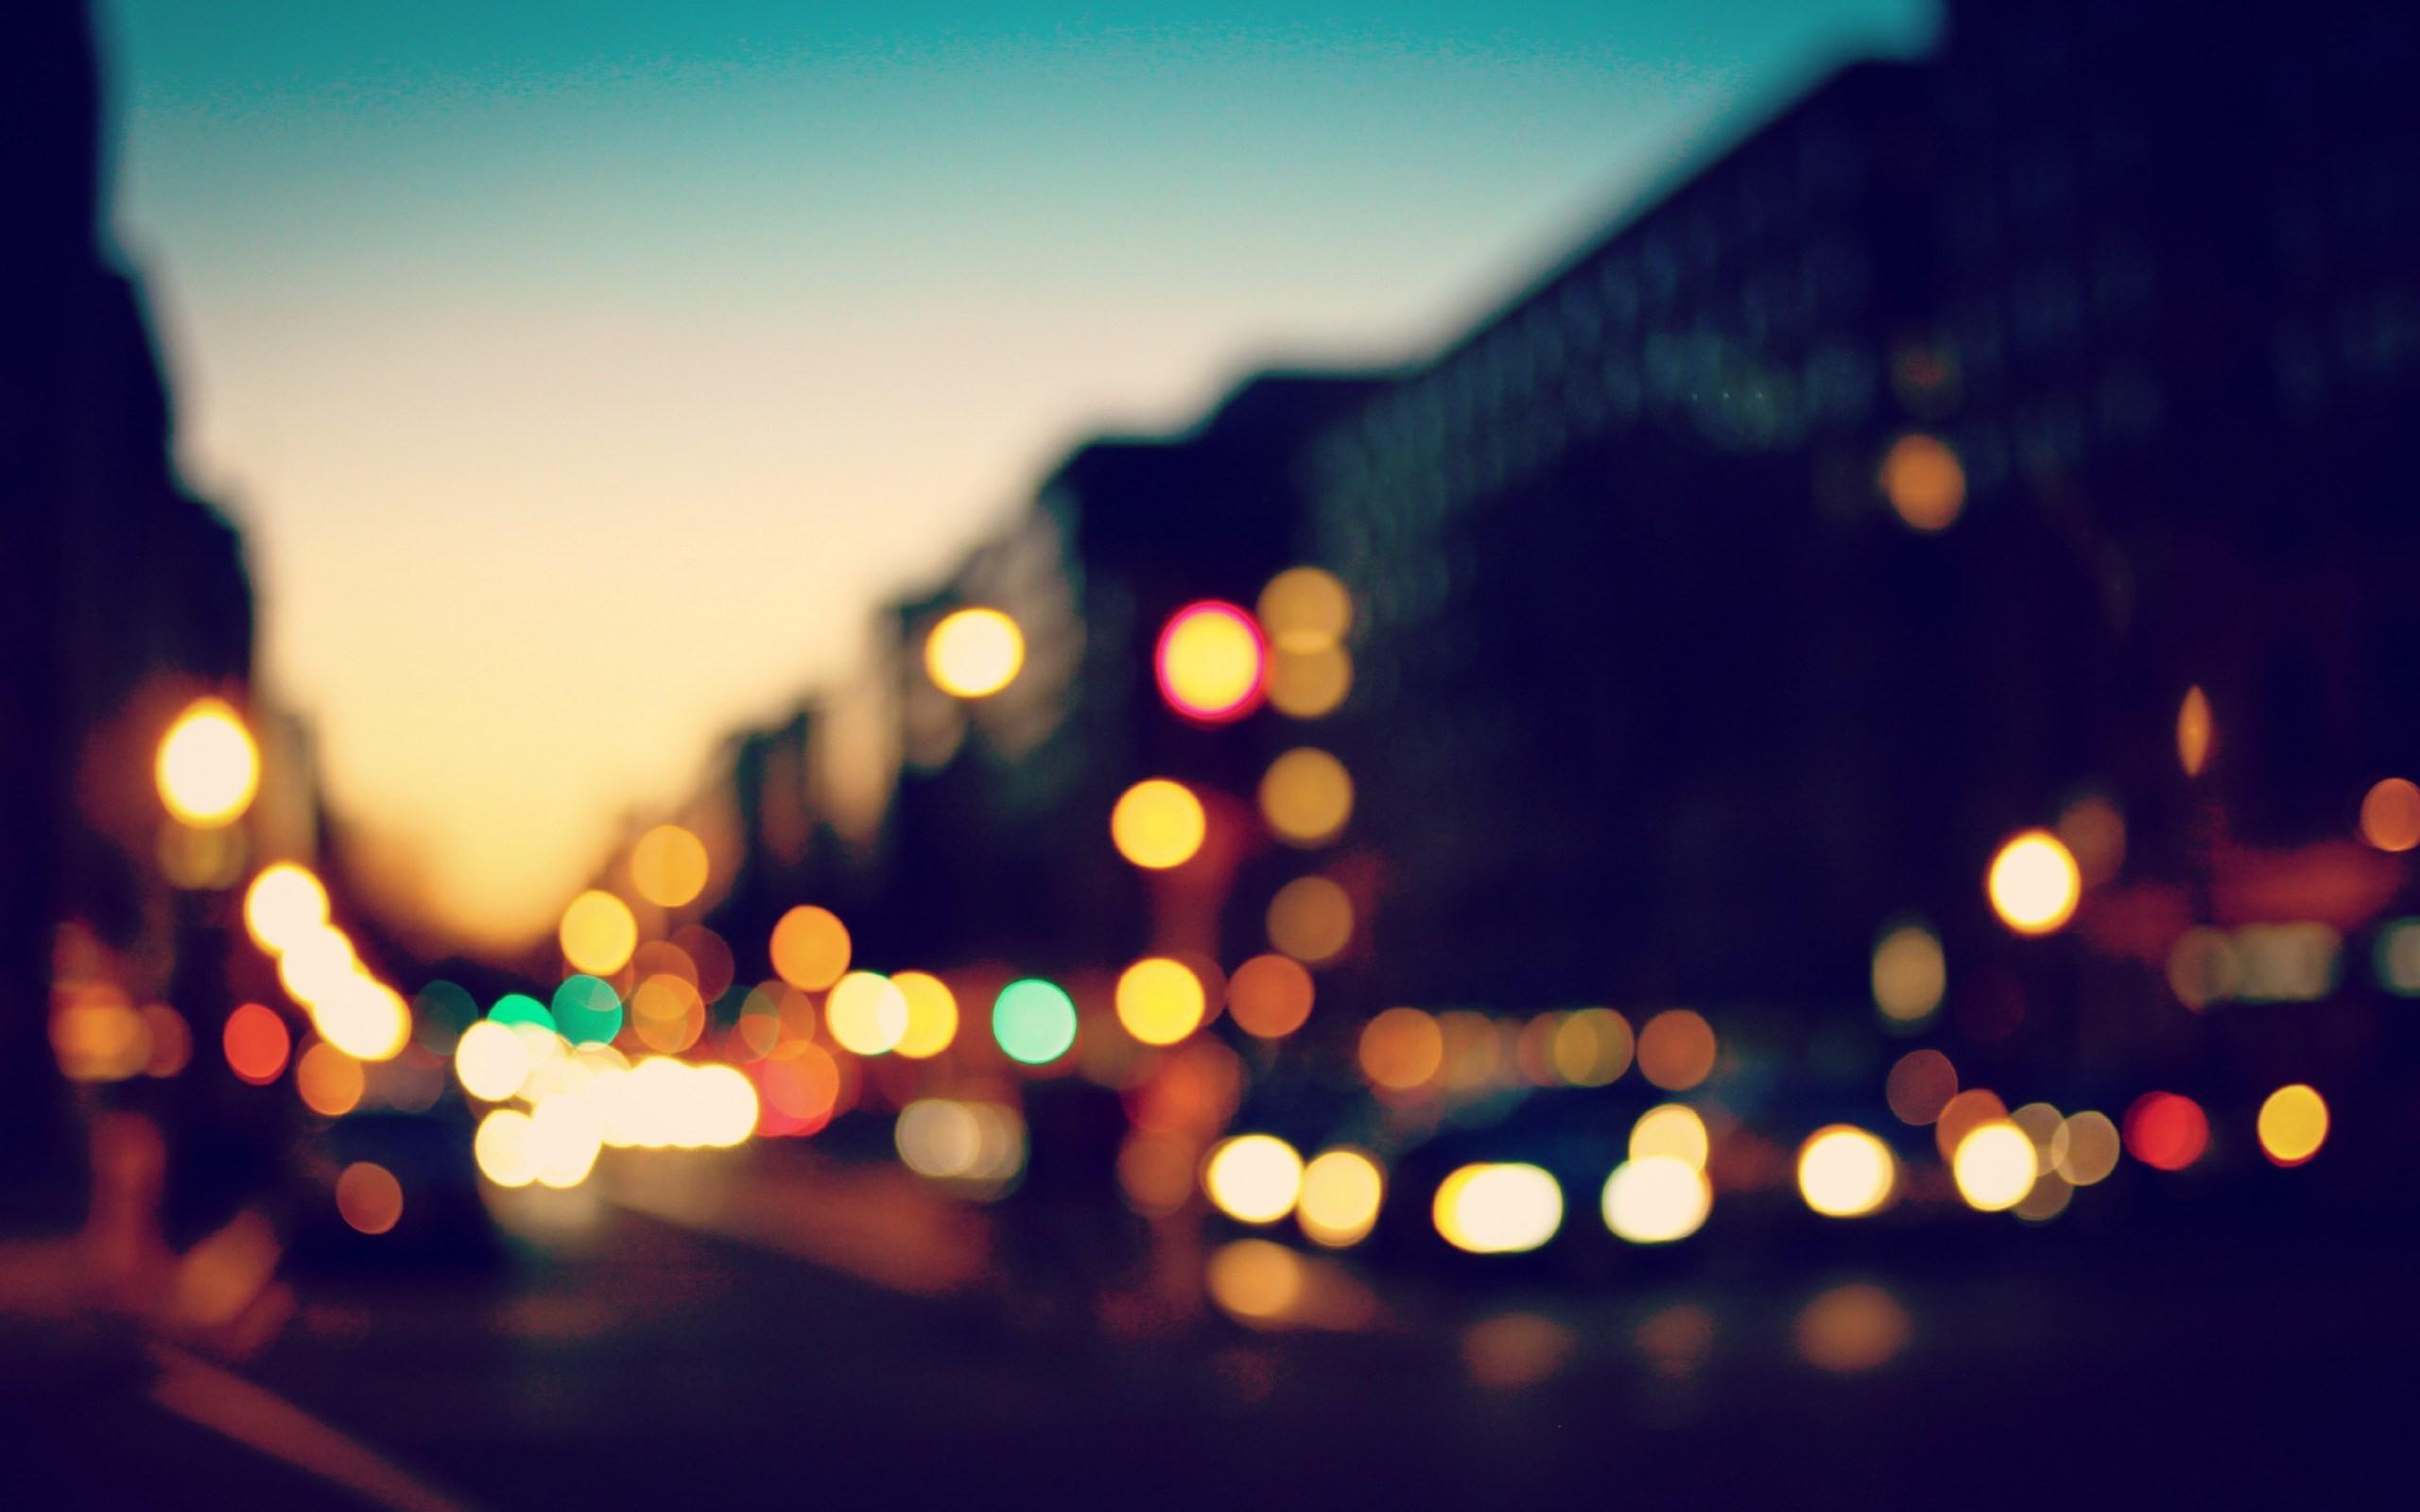 2560x1440 city blurred 1440p